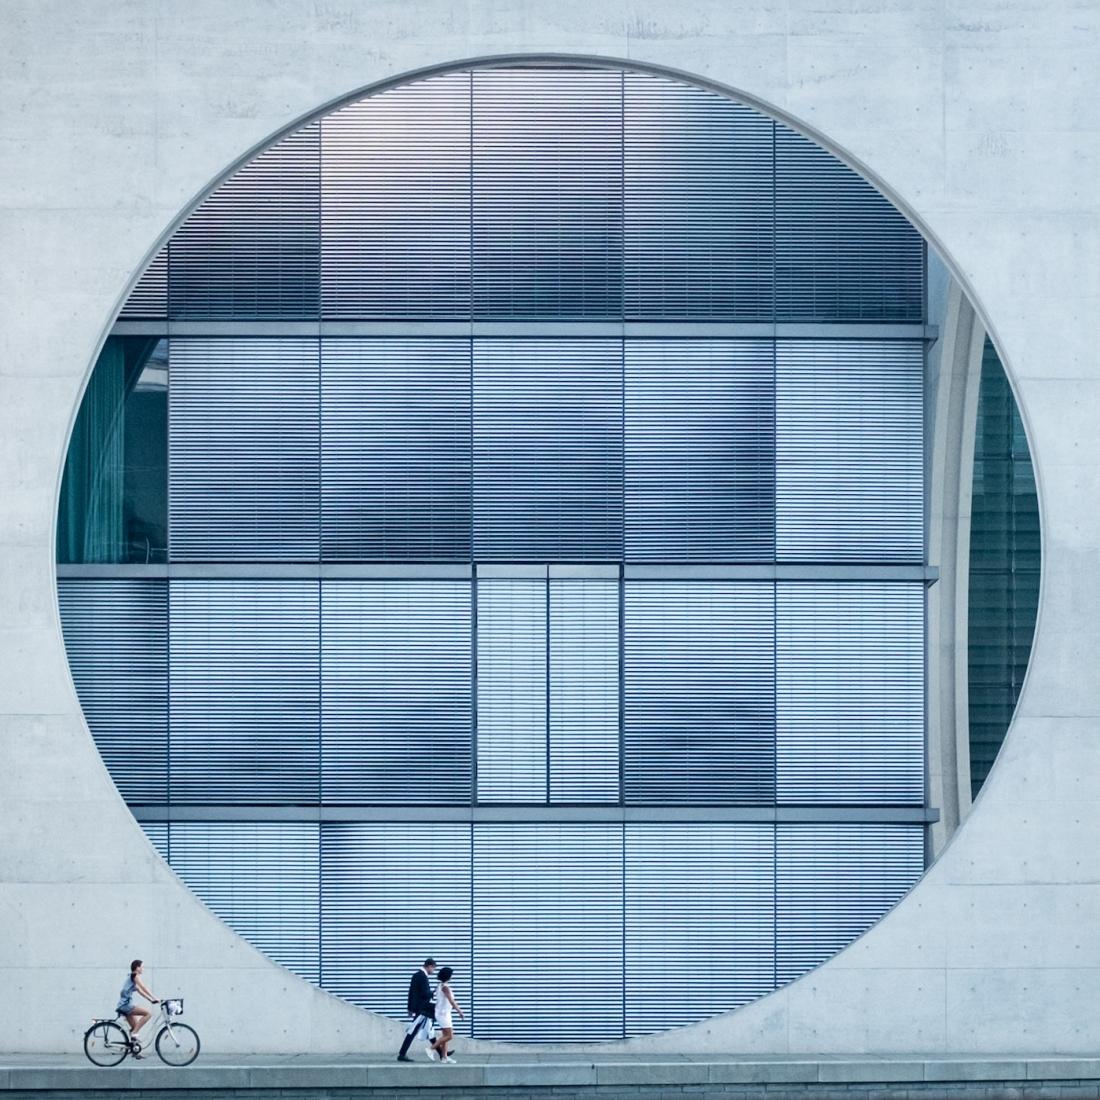 Copyright: © Tim Cornbill, United Kingdom, 1st Place, Open, Architecture, 2017 Sony World Photography Awards